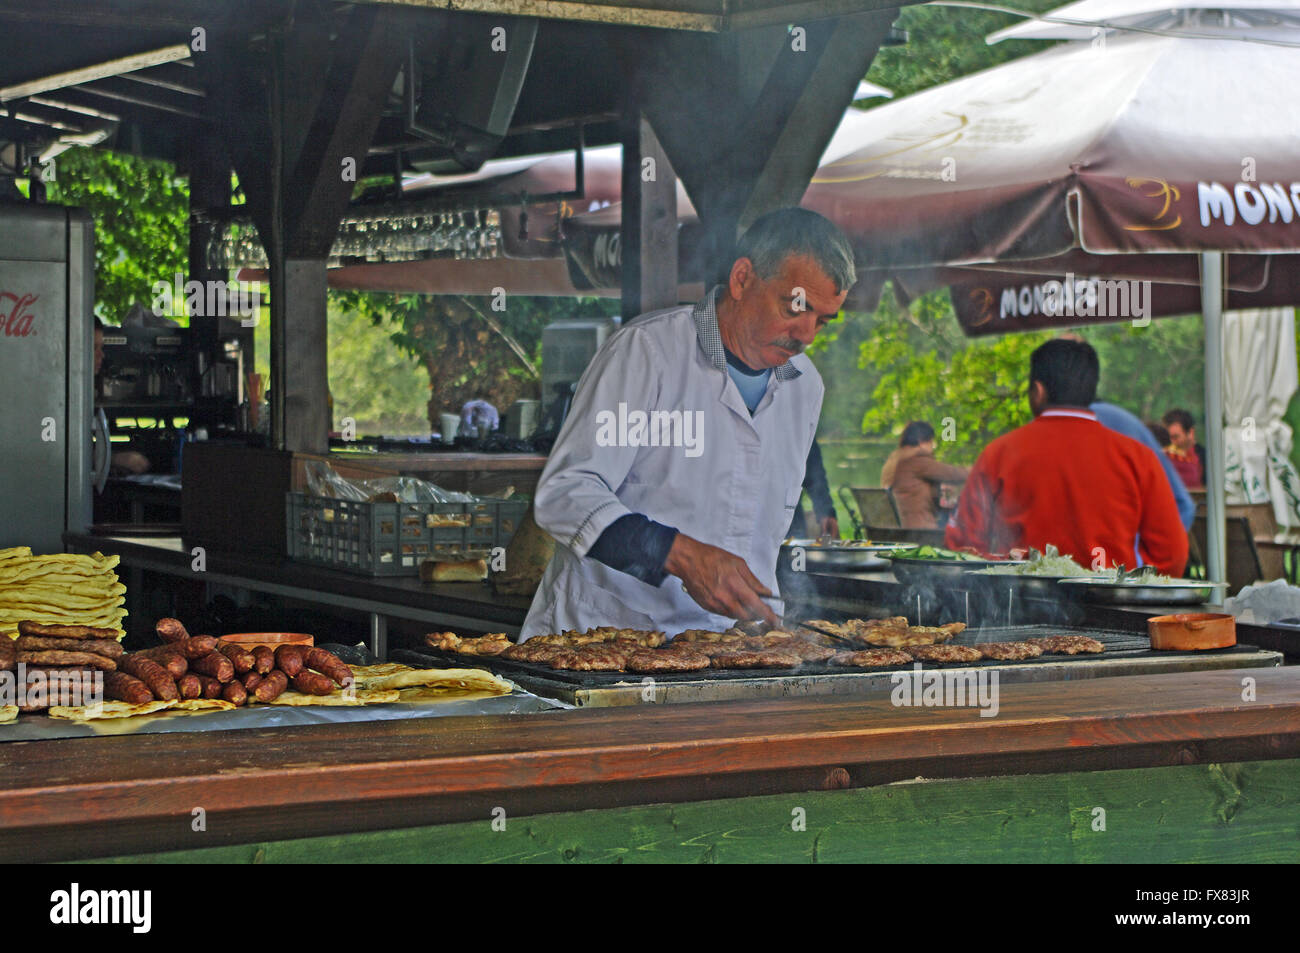 Snake Bar, Fast Food, Near St Naun Monastery, Macedonia - Stock Image